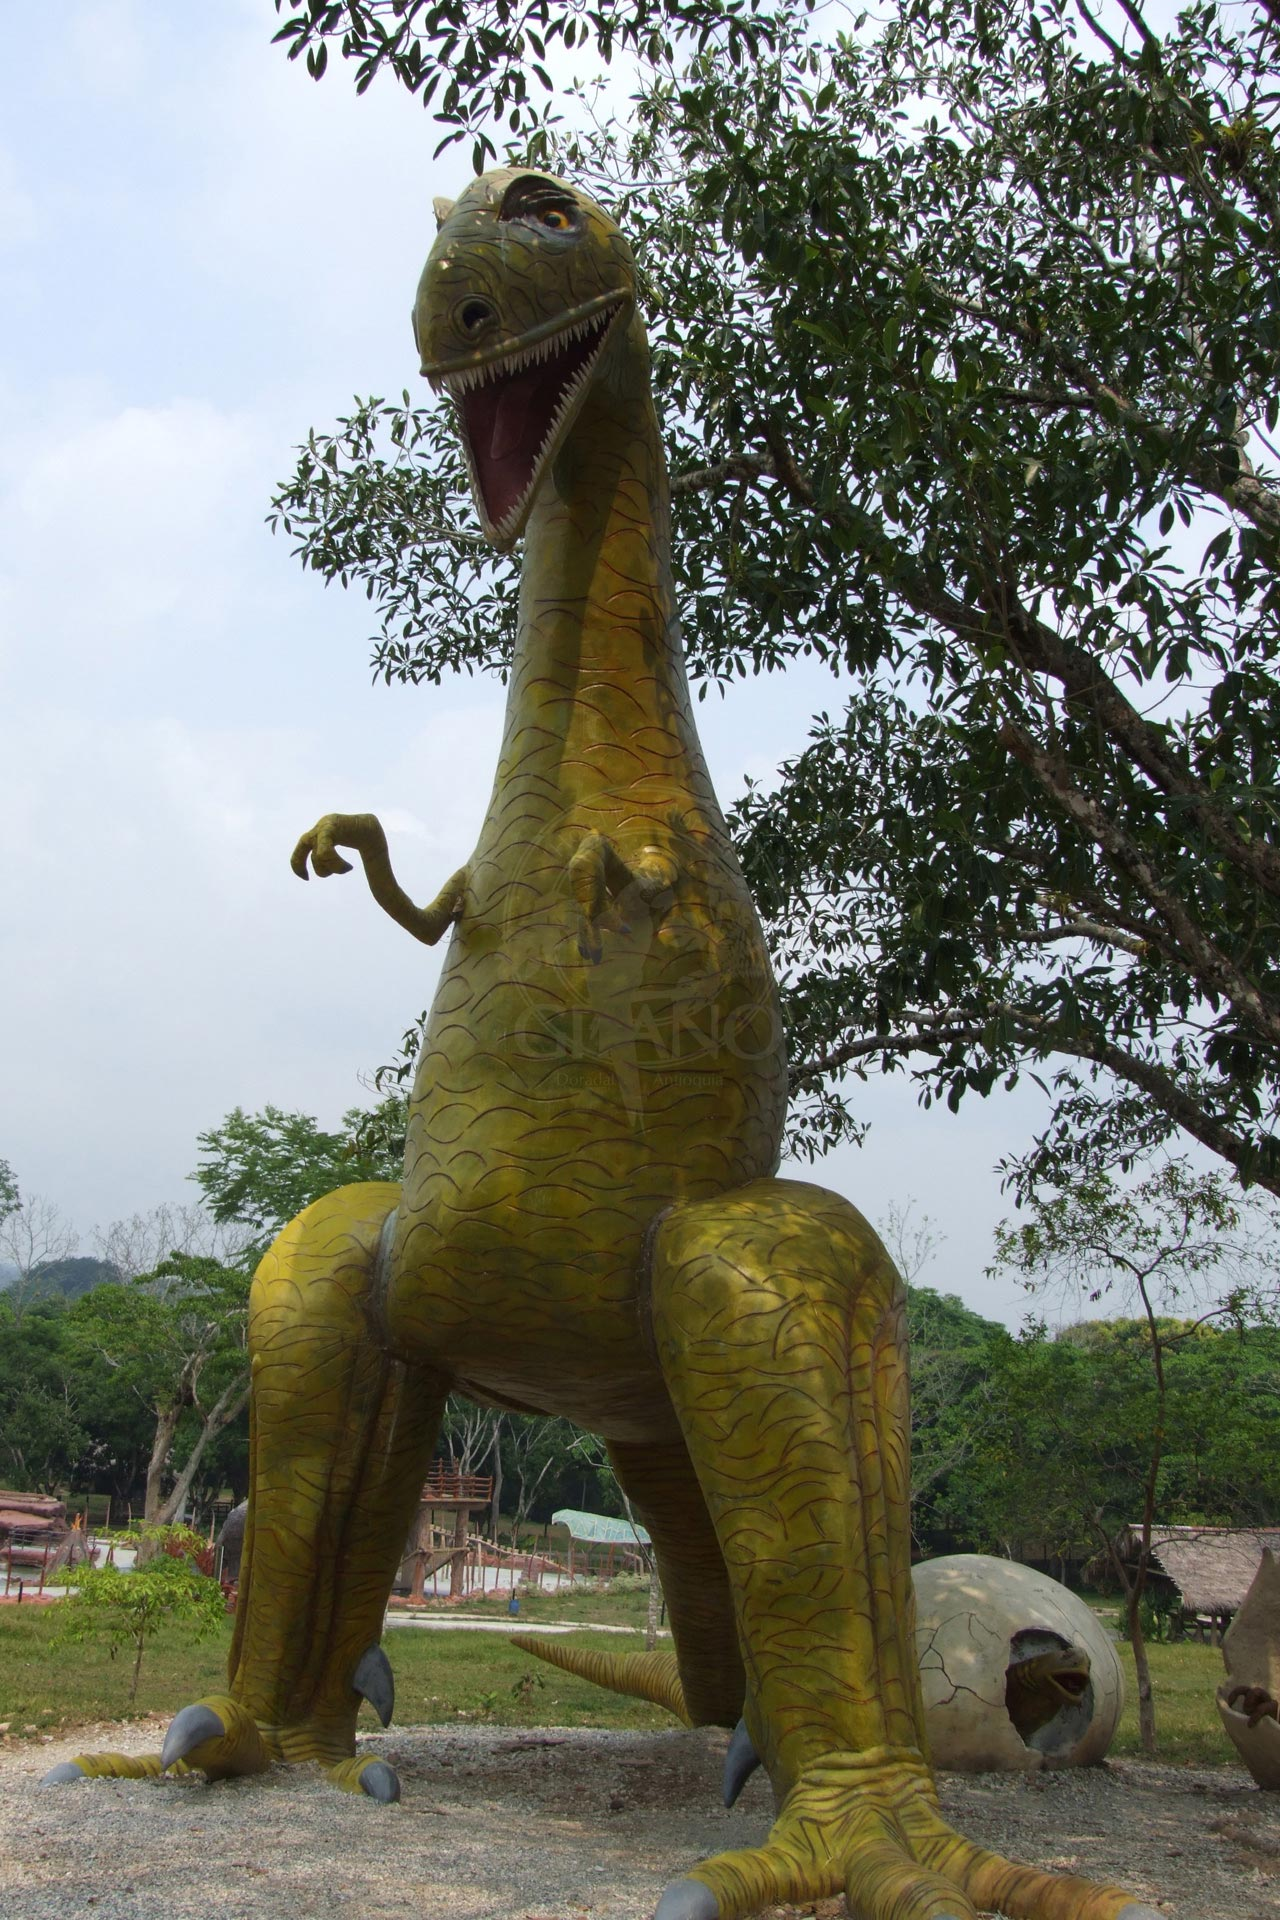 Camina rodeado de imponentes dinosaurios - Hotel & Restaurante Parador del Gitano - Nápoles - Doradal - Rio claro